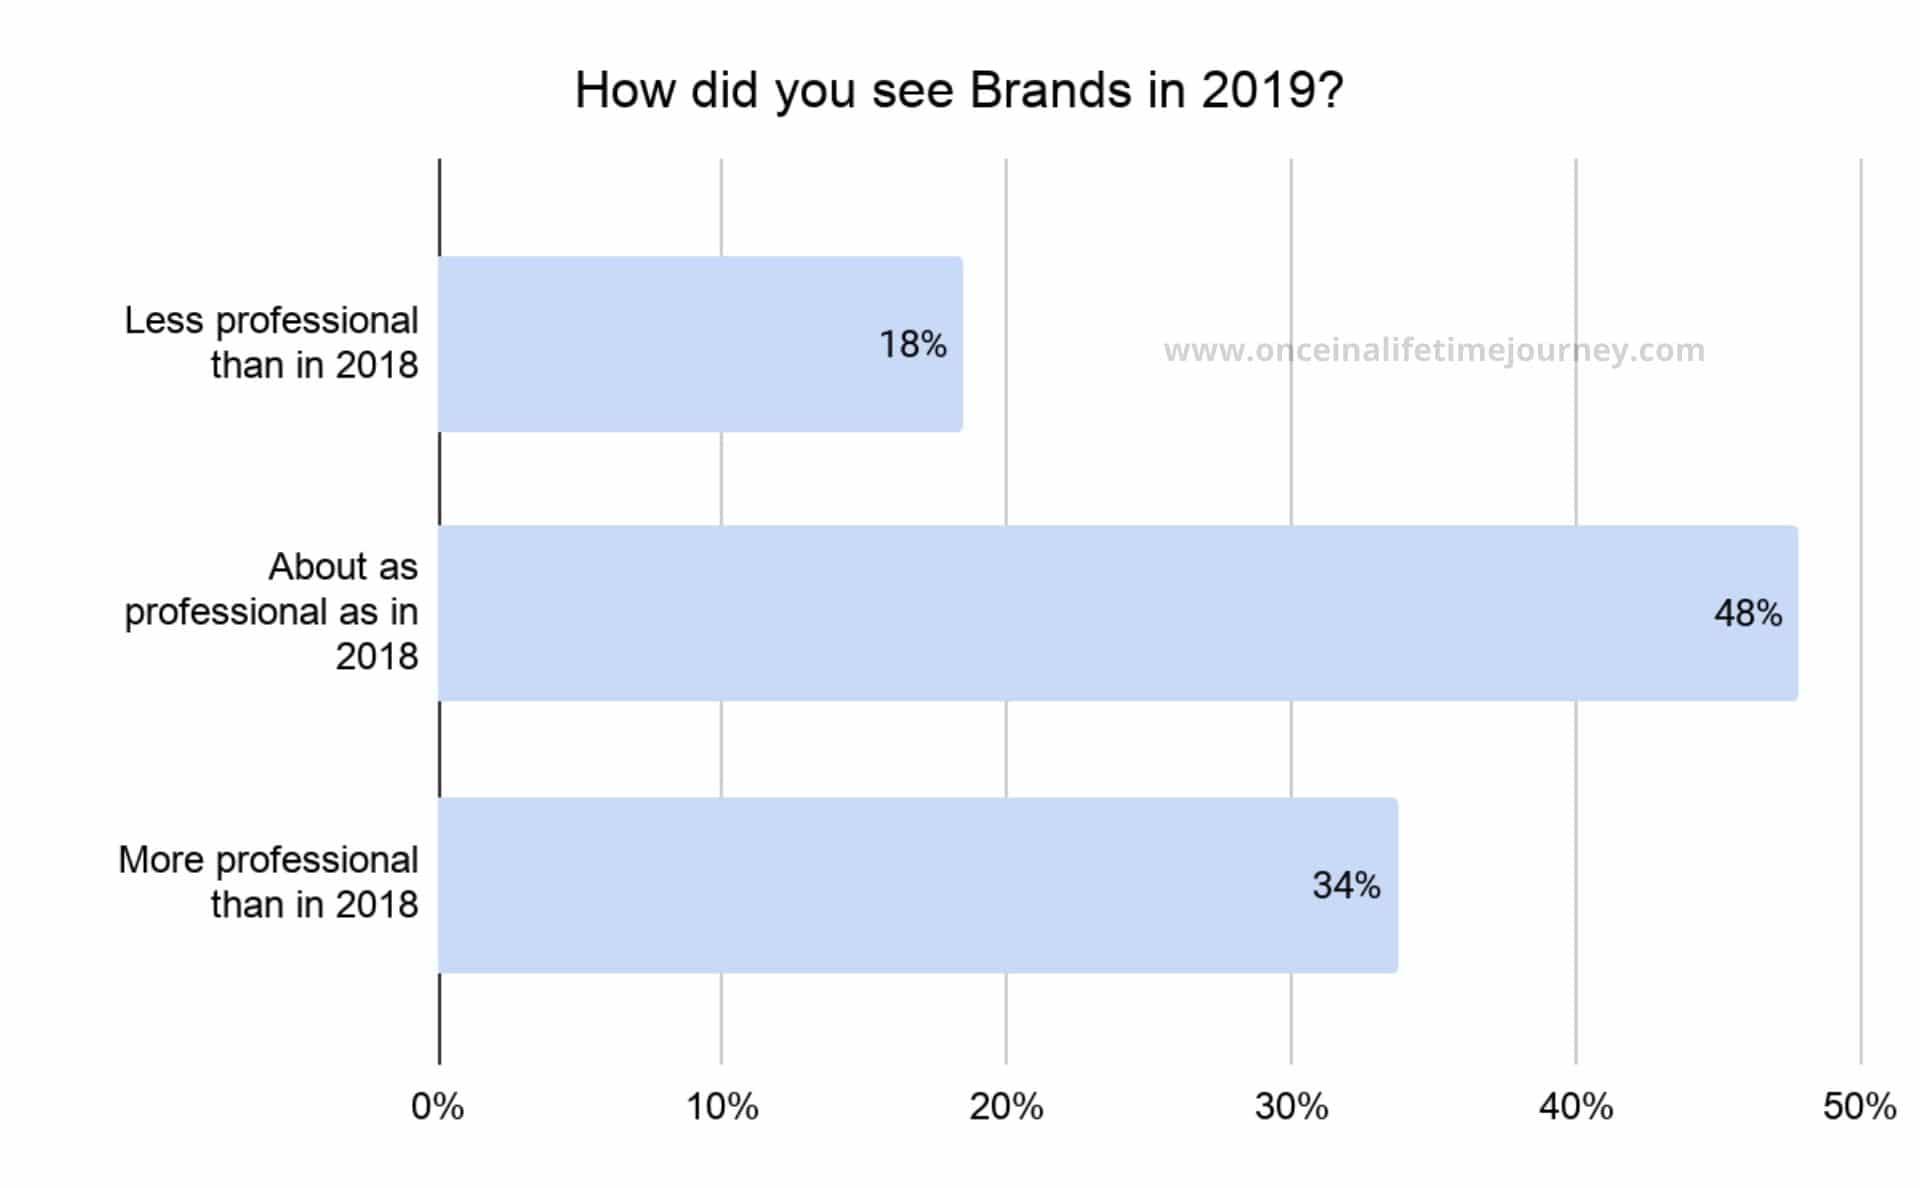 How Content Creators saw brands in 2019